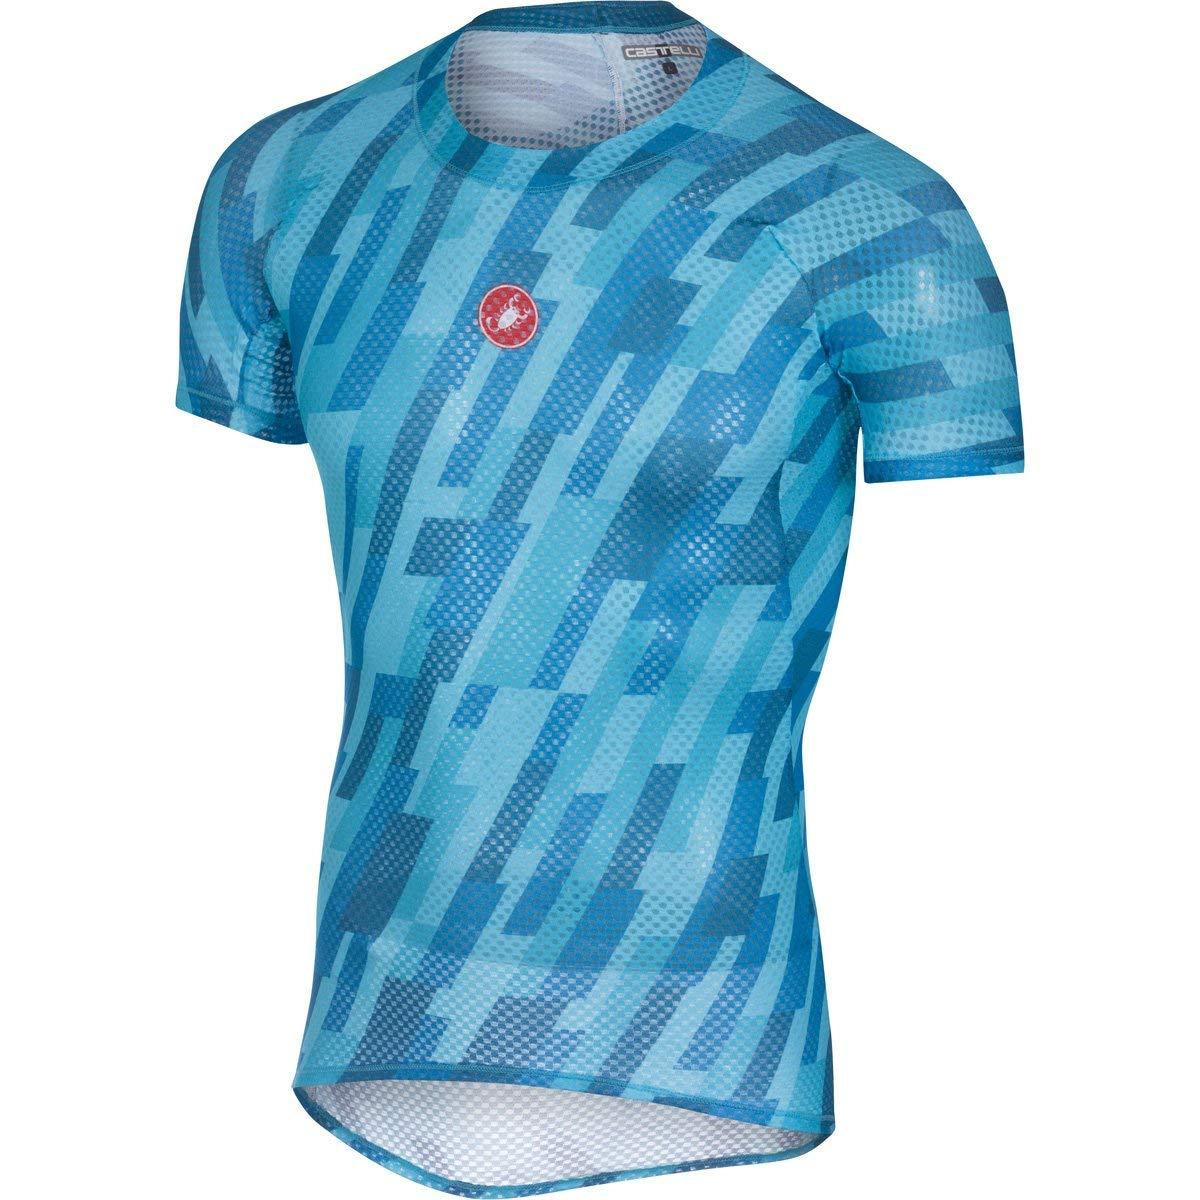 439c59c74b1e42 Get Quotations · Castelli 2018 Men s Pro Mesh Short Sleeve Cycling Base  Layer - A18014